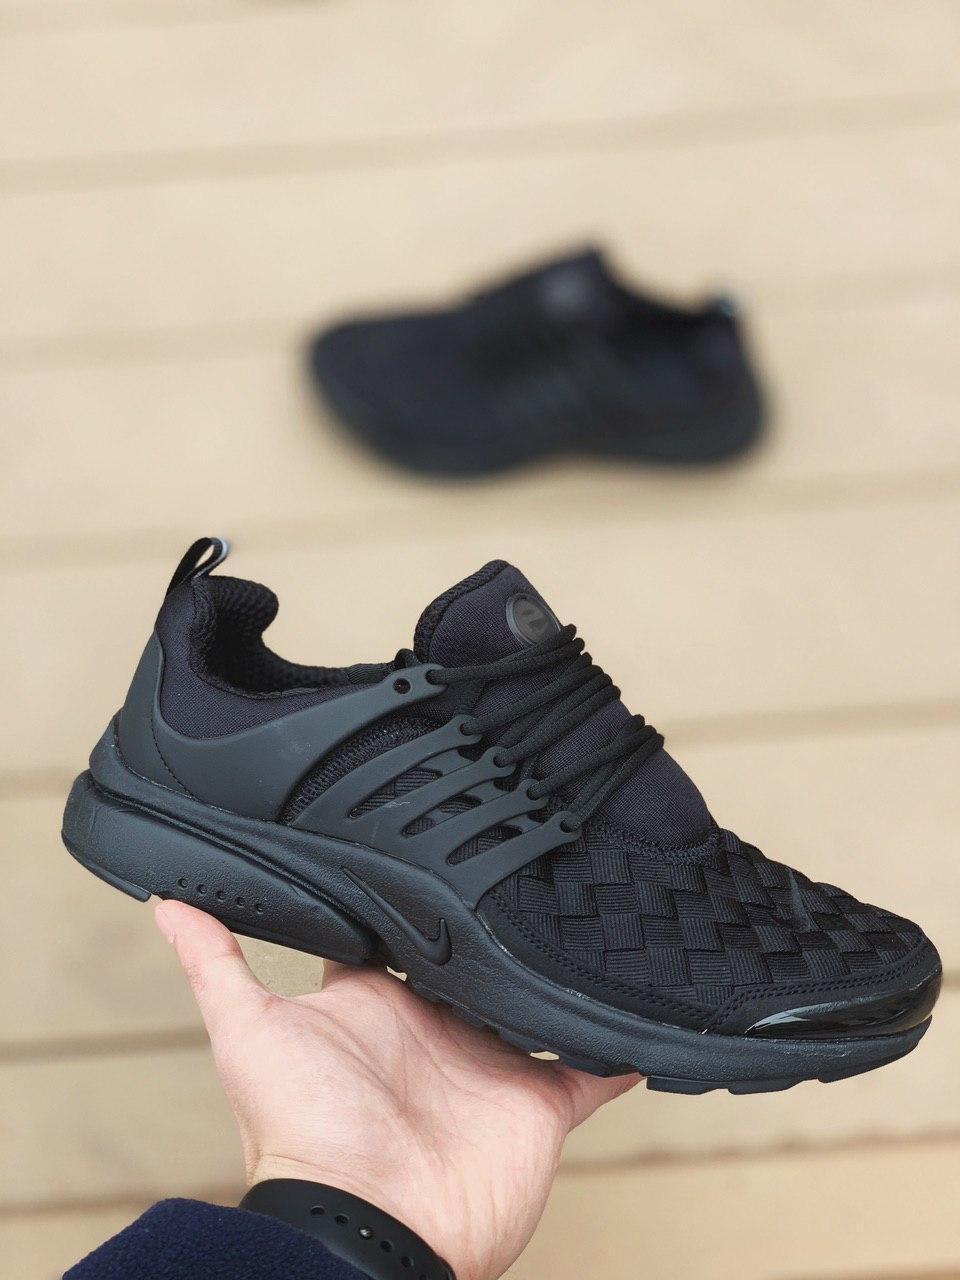 Мужские кроссовки Nike Presto, Реплика